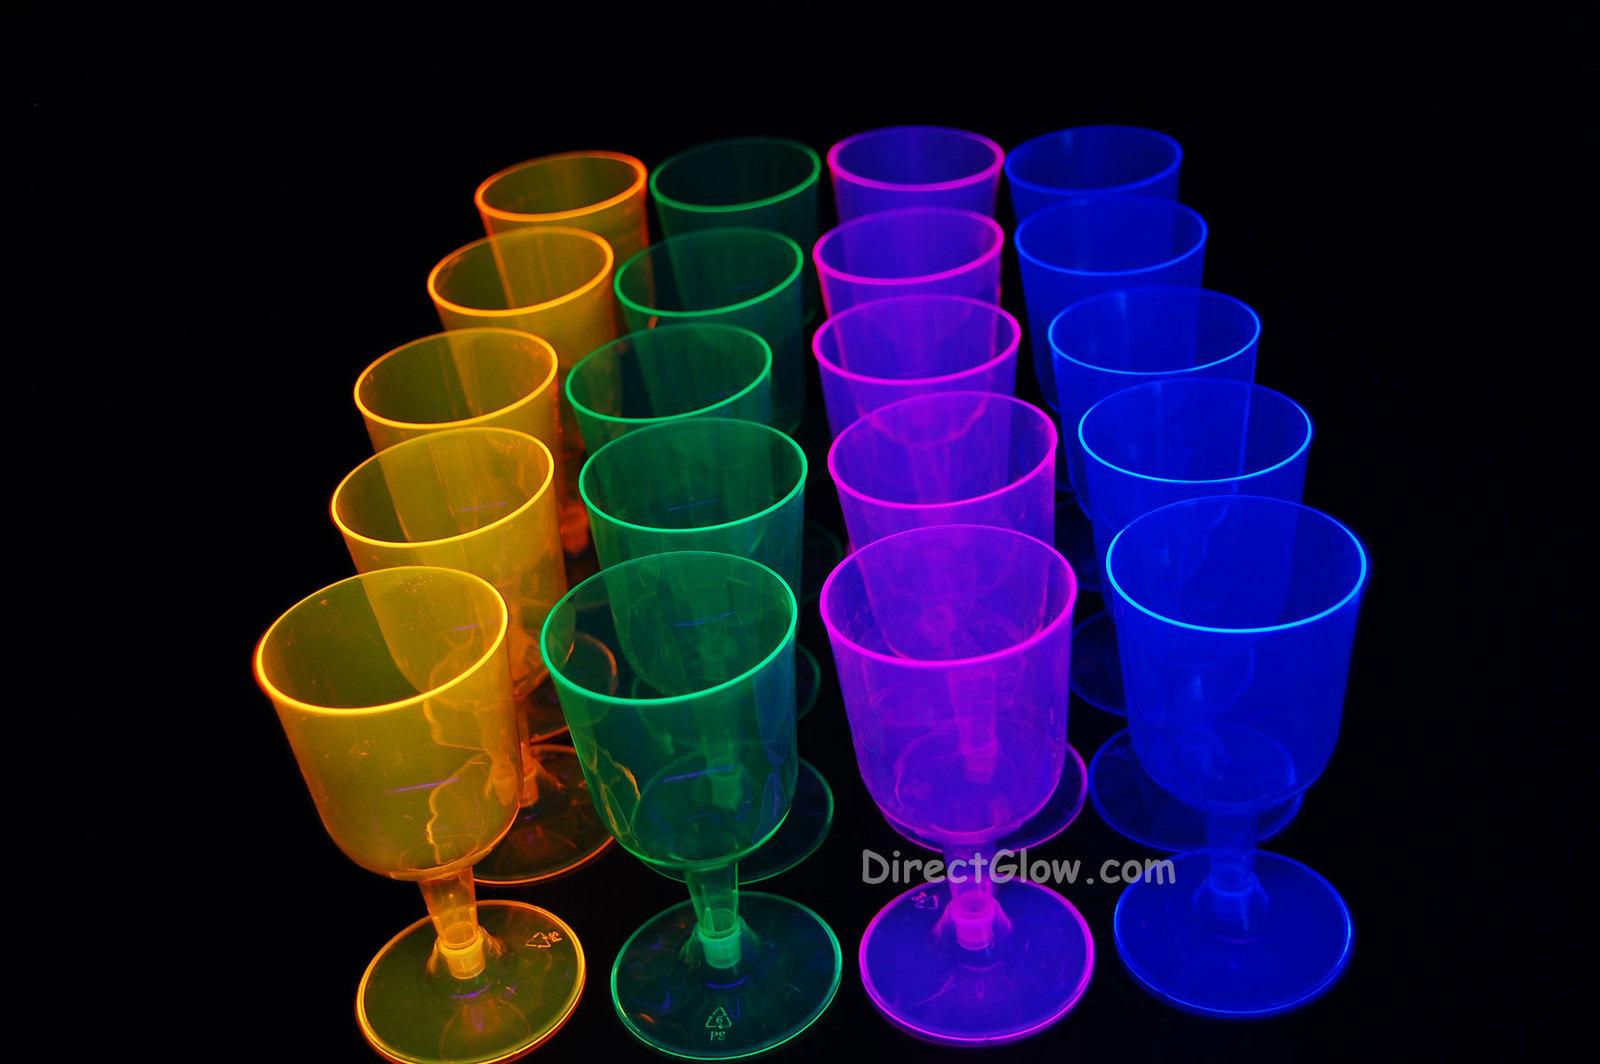 Neon Blacklight Reactive Wine Glasses - 20 ct